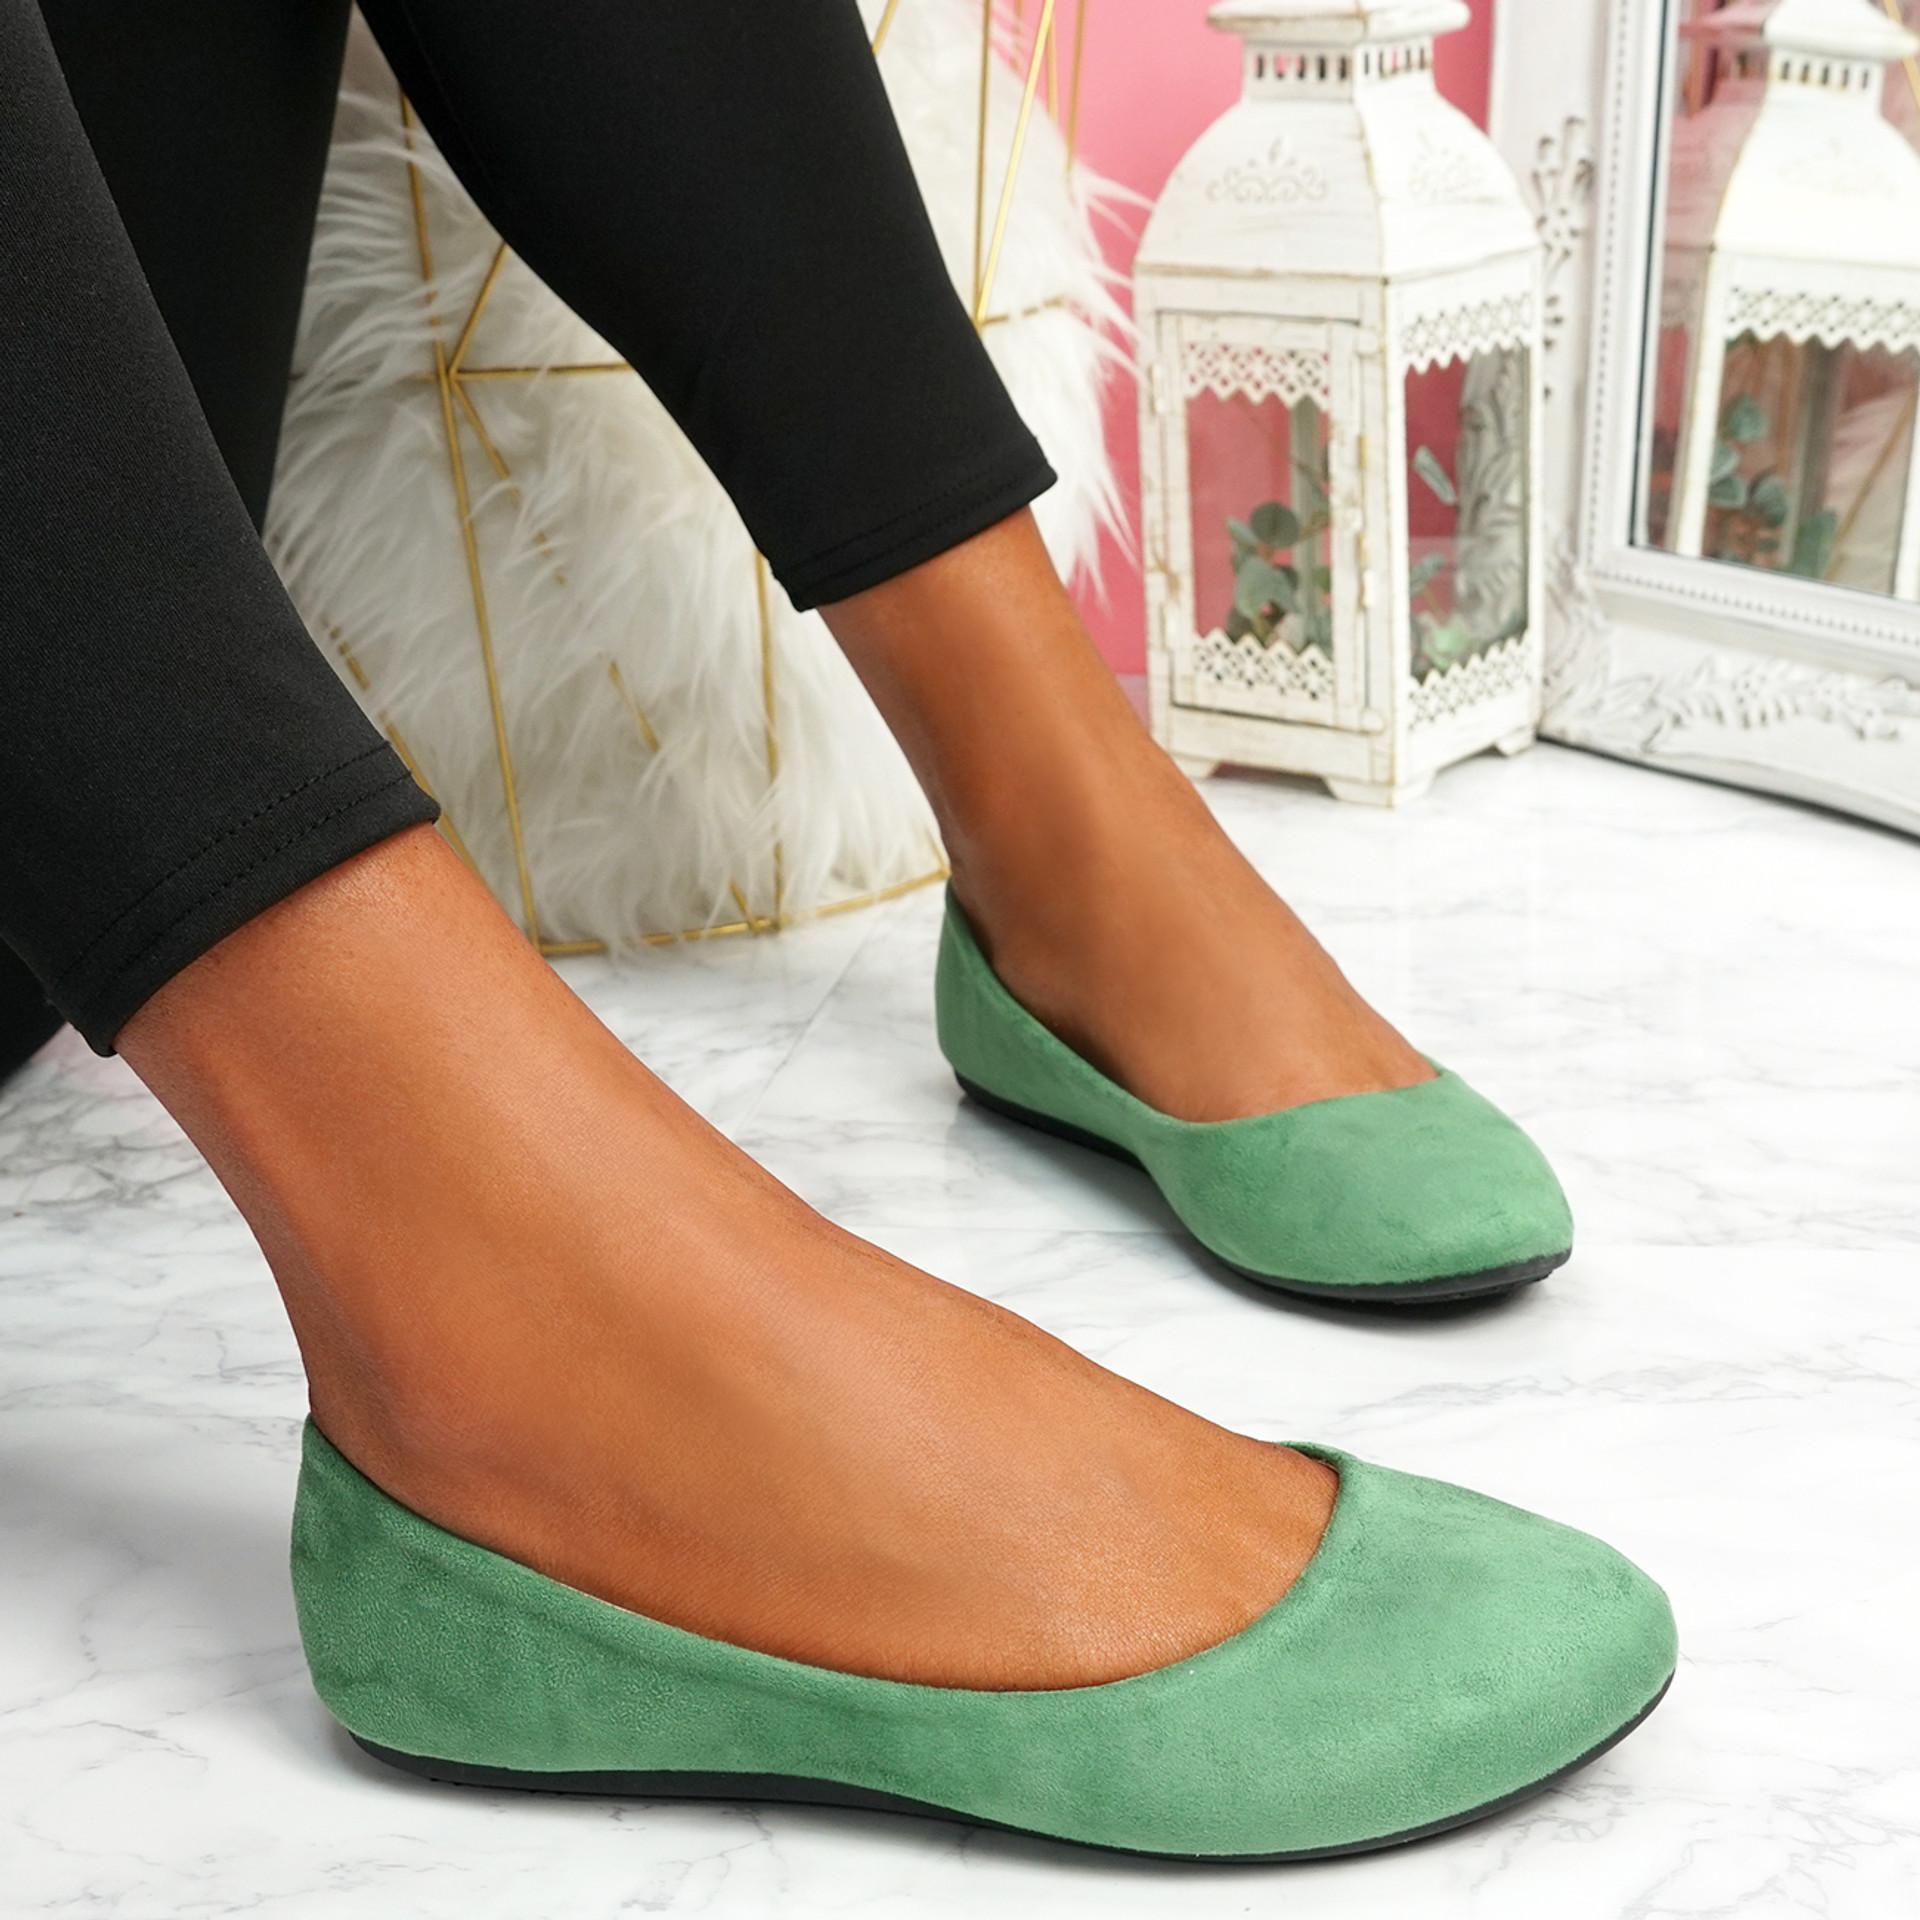 Evera Green Slip On Ballerinas